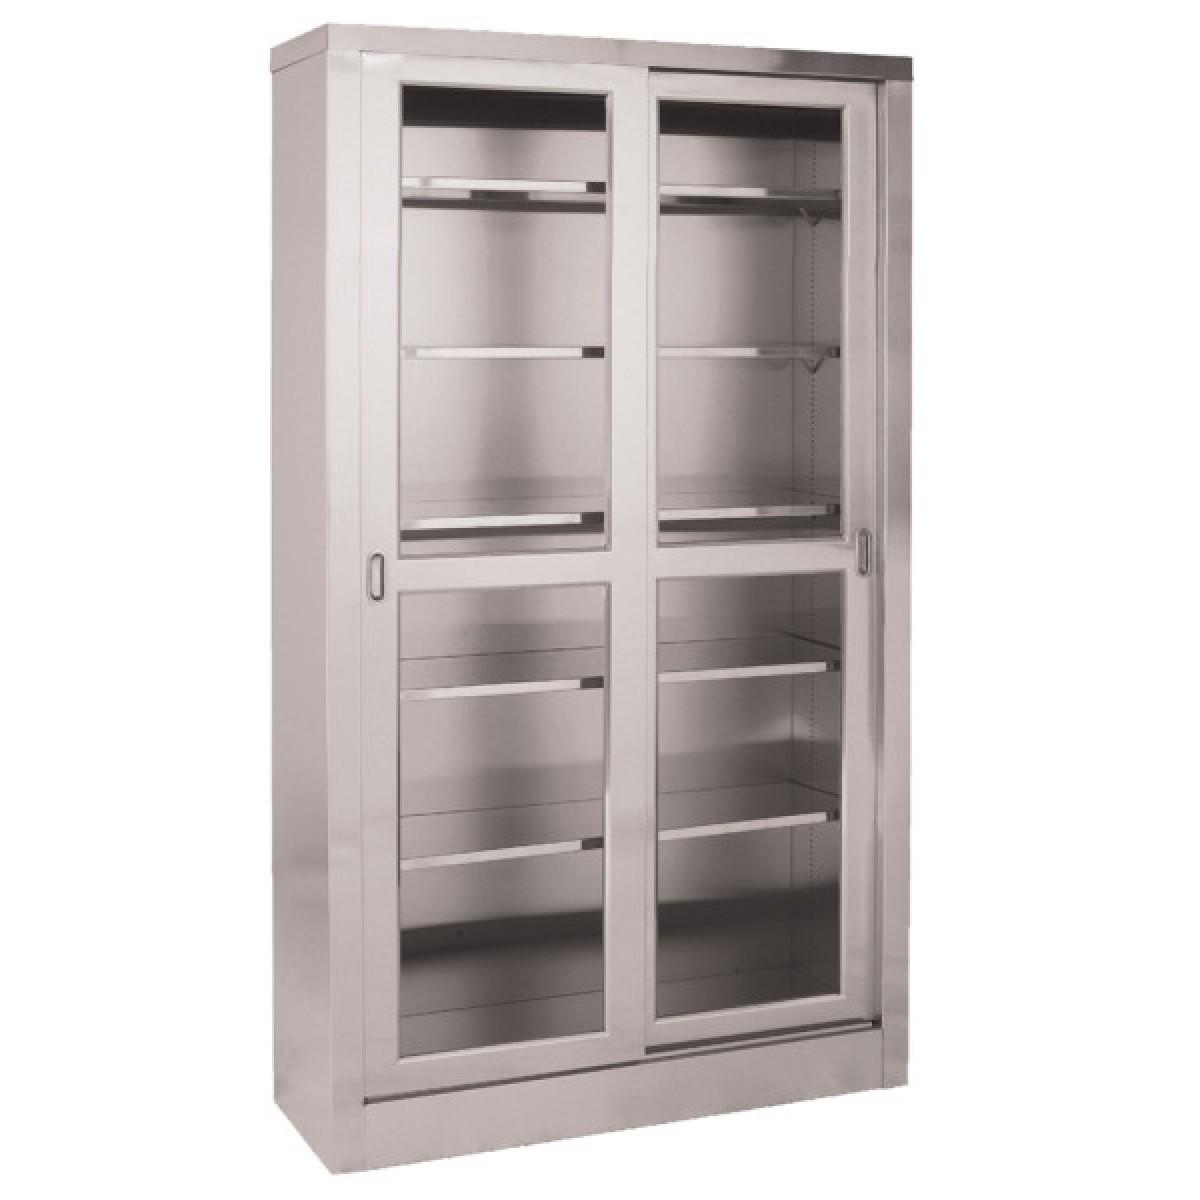 Umf Ss7816 Large Sliding Door Stainless Steel Storage Cabinet